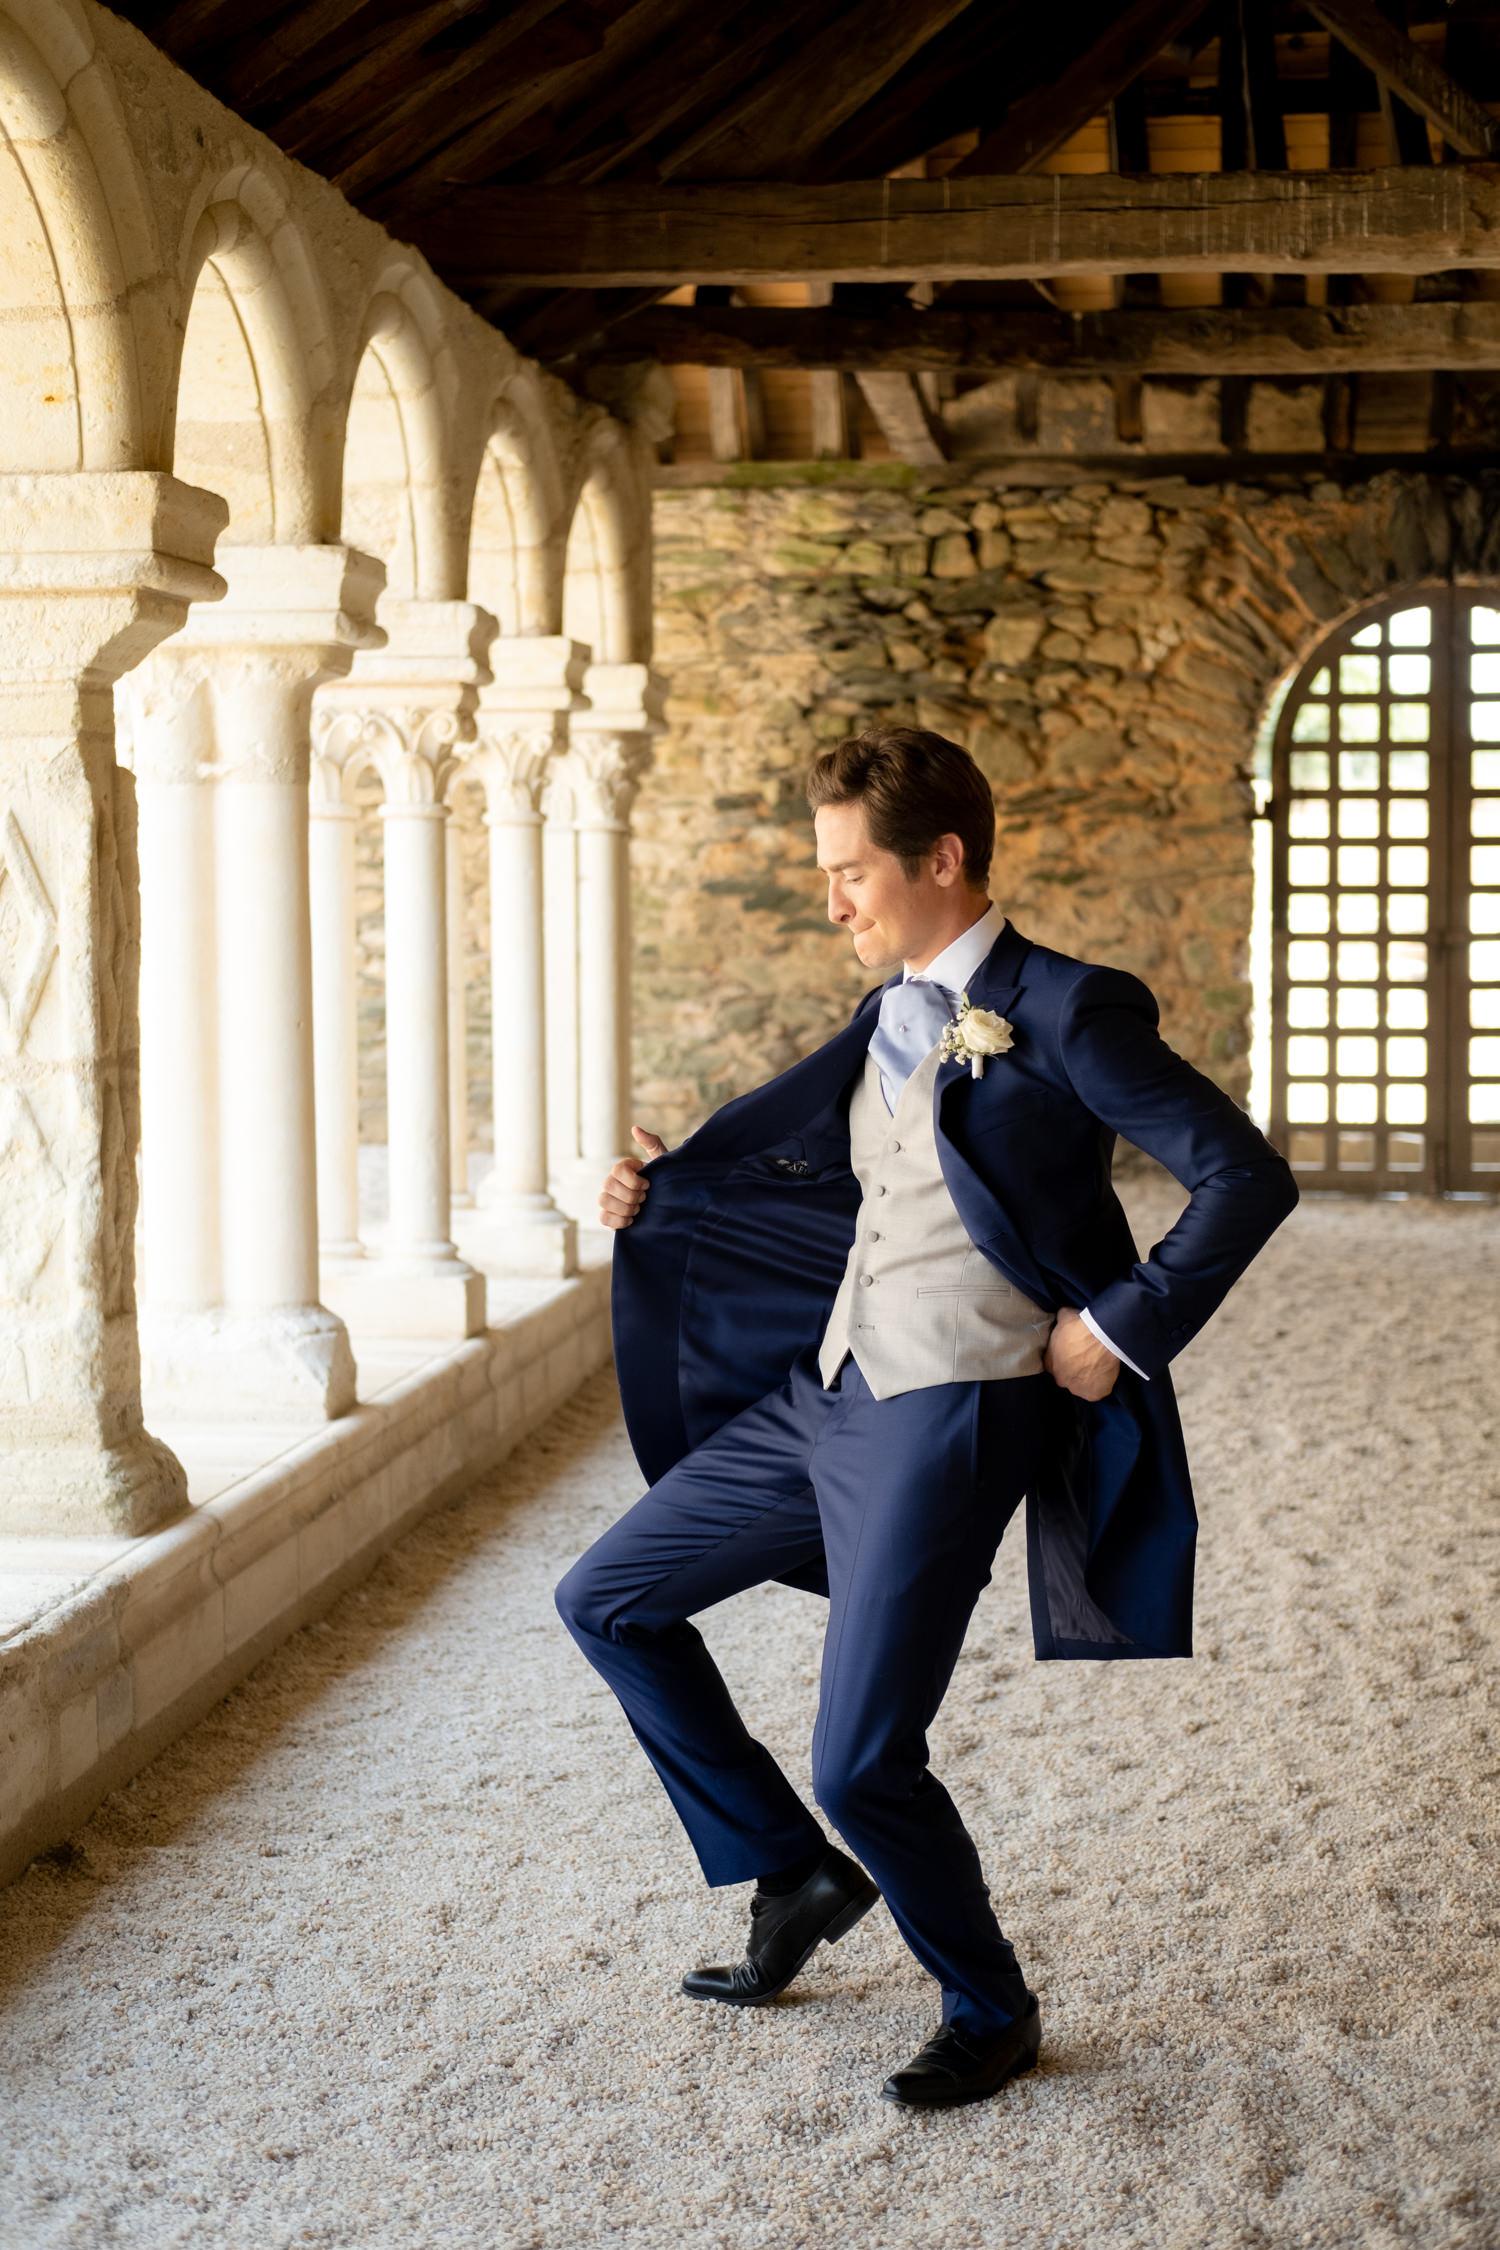 reportage mariage, photo mariage, photographe mariage, mariage Anjou, photographie mariage Anjou, mariage pays de Loire, photographe mariage pays de Loire